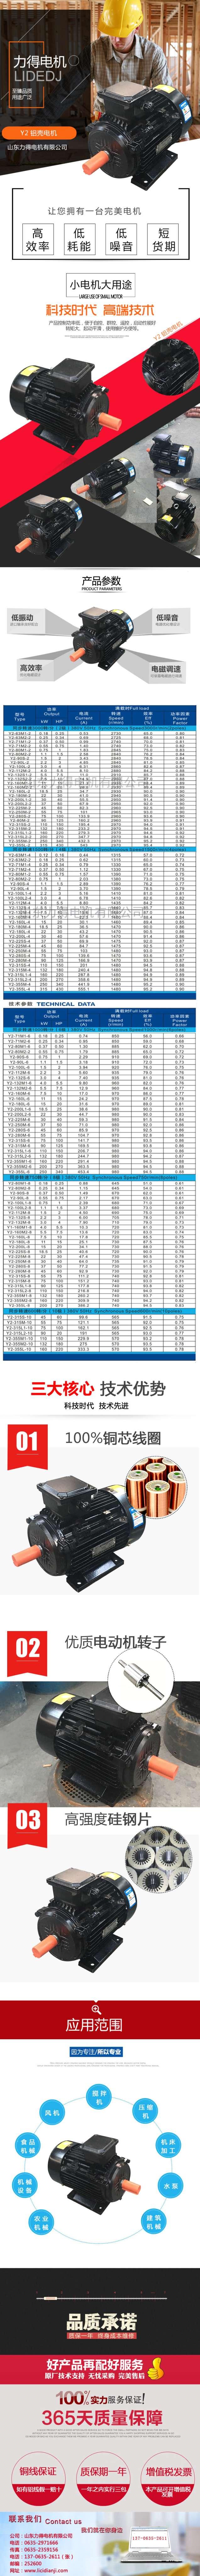 y2铝壳万博手机注册登录.jpg